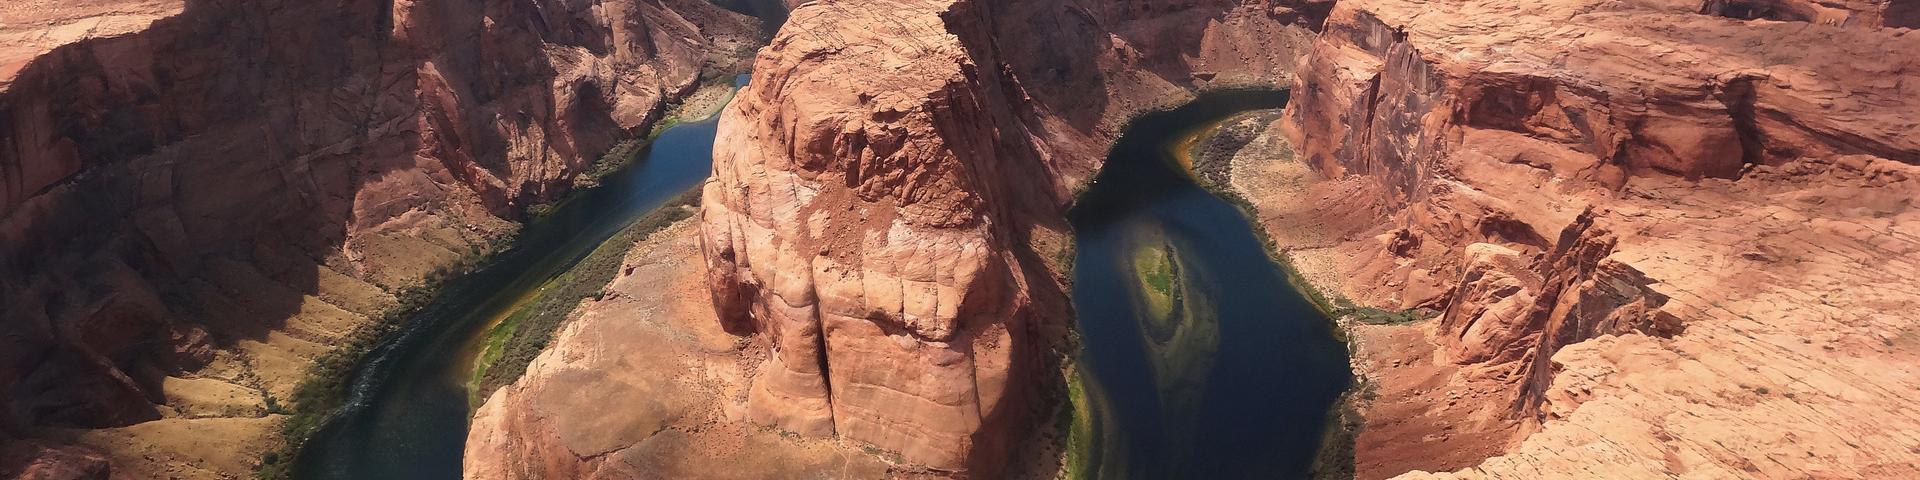 Survol en avion du lac Powell et de la Colorado River, Etats-Unis